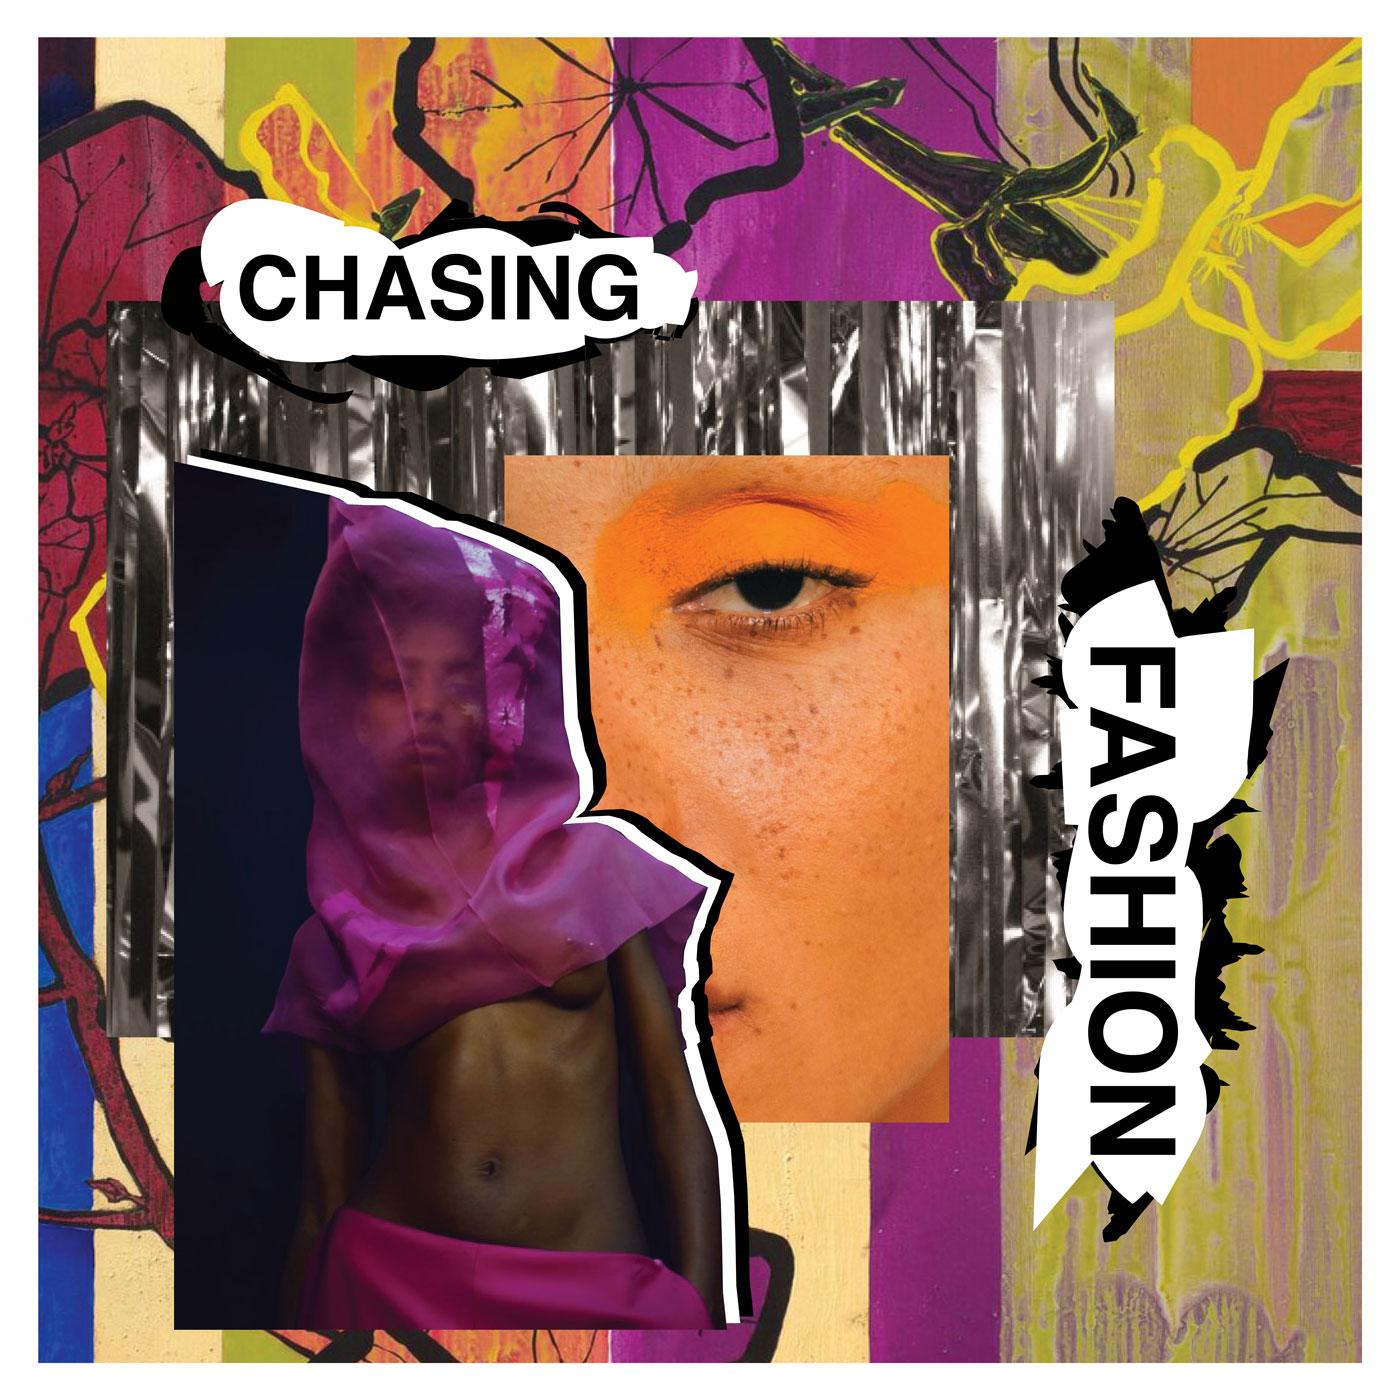 ChasingFashionArtwork-01.jpg